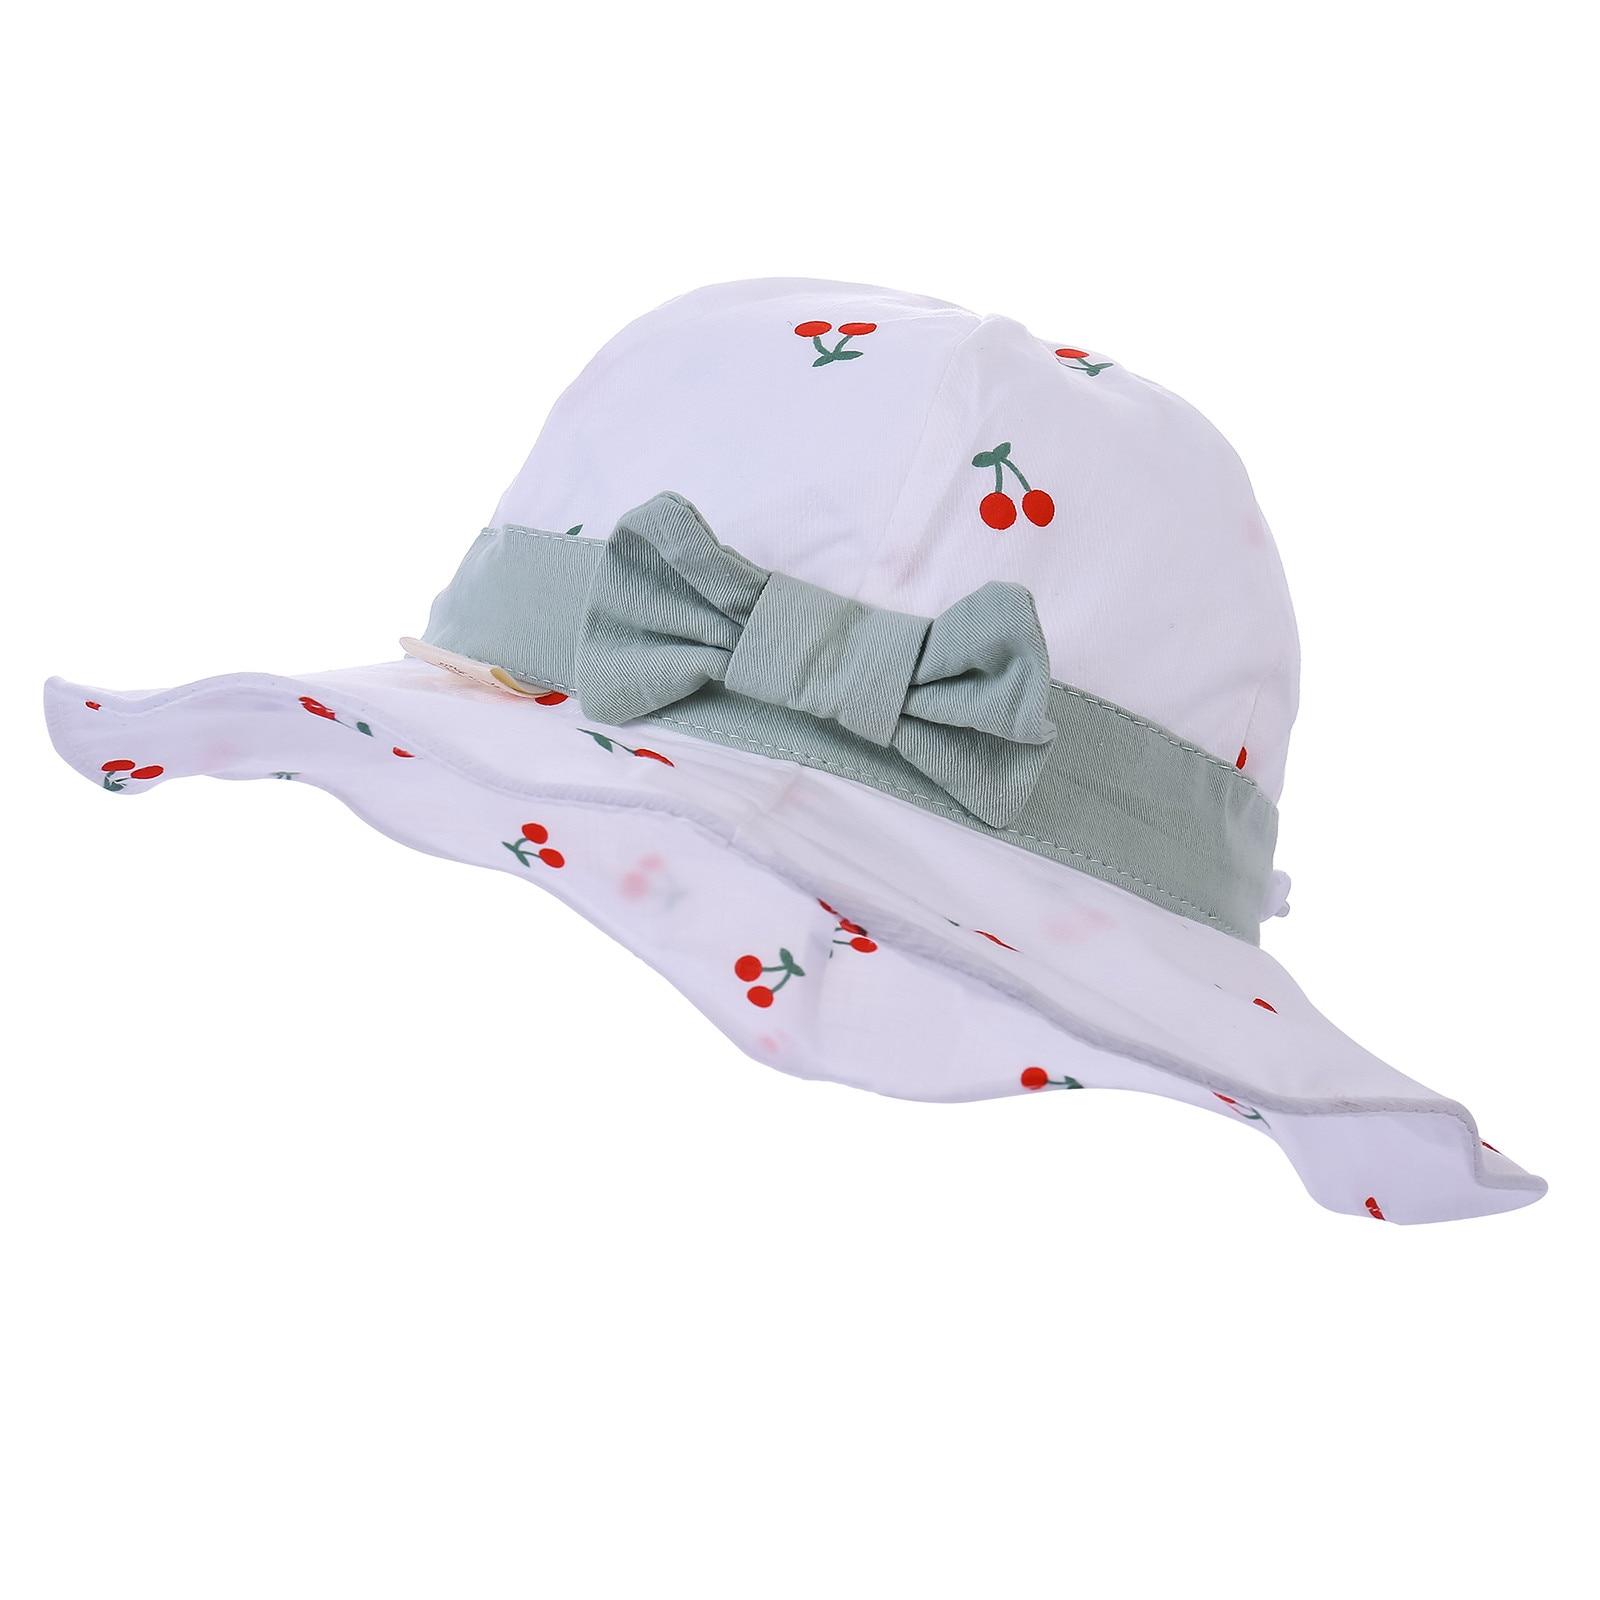 baby cap Toddler Kids Summer Fruit Print Bow Outdoor Children Sun Beach Fisherman's Hat кепка casquette кепка для мальчика